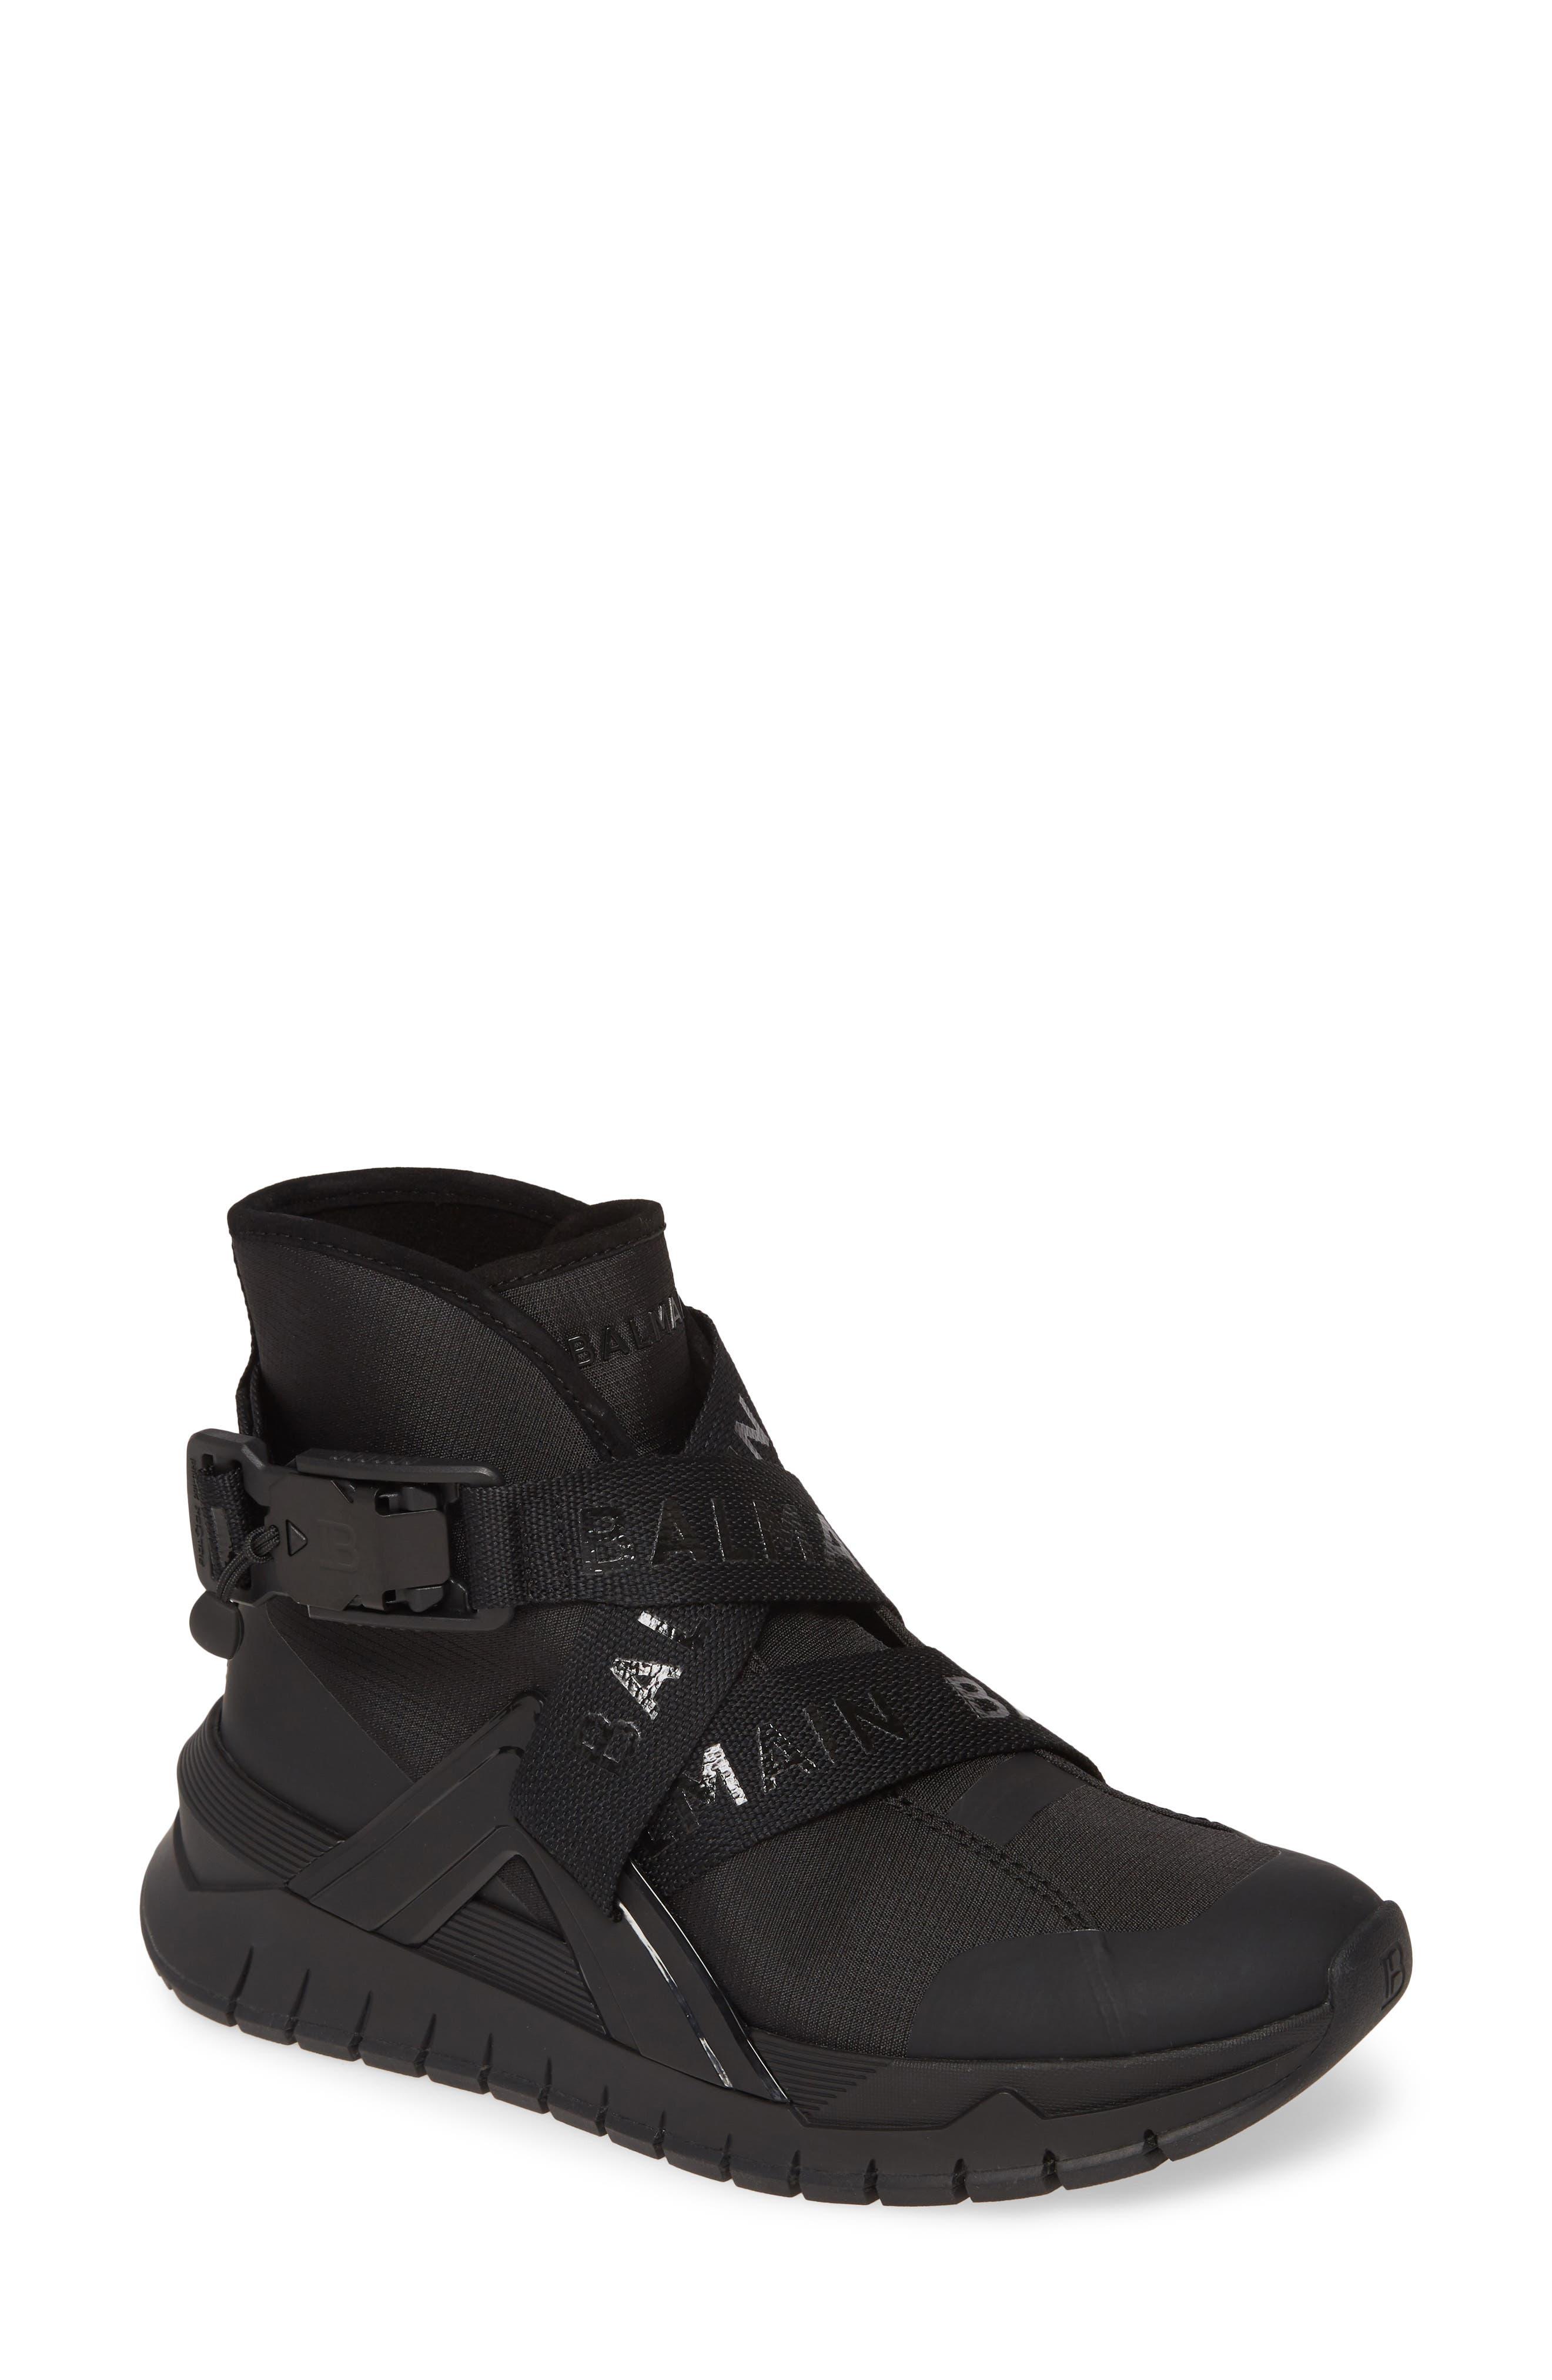 Balmain designer Shoes for men